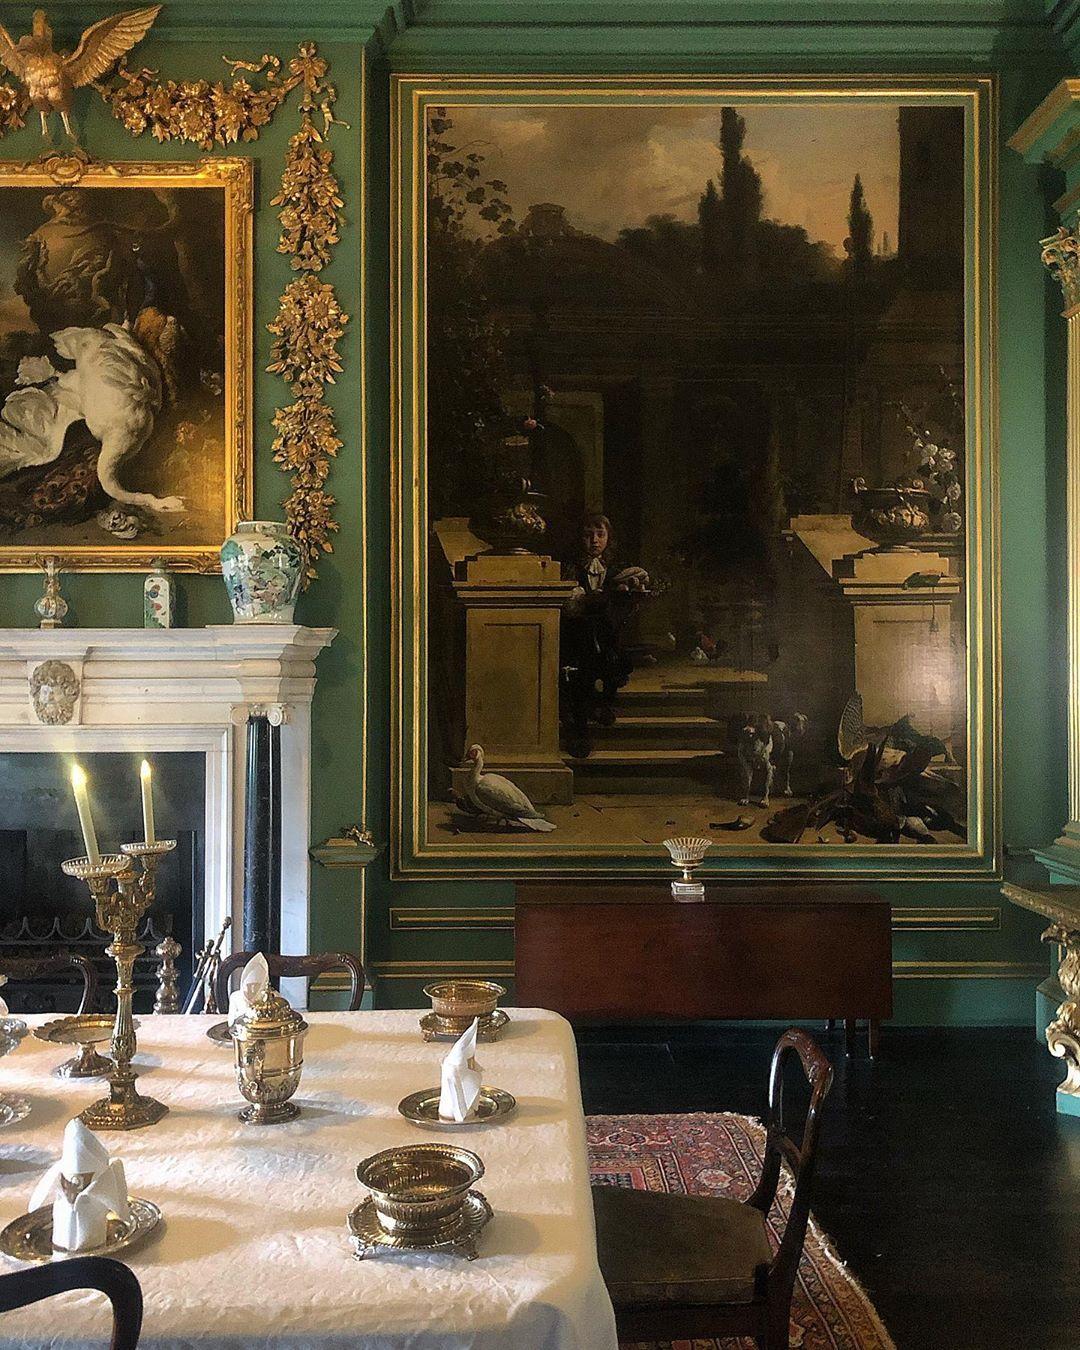 Hondecoeter Heaven #Interiors #countryhouse #fulllook